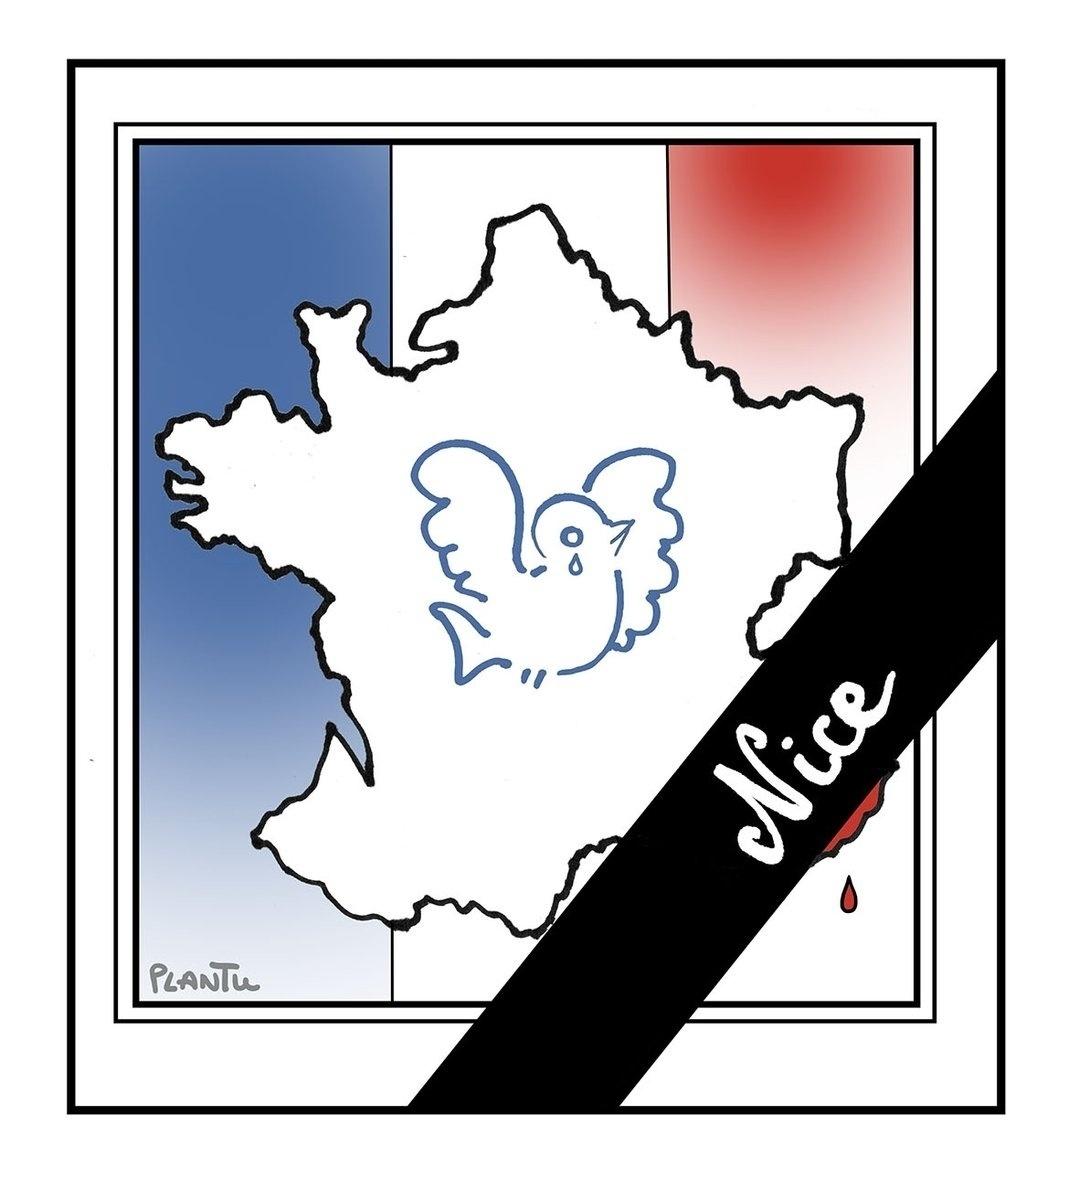 15.jul.2016 - O luto por Nice atravessa a bandeira francesa